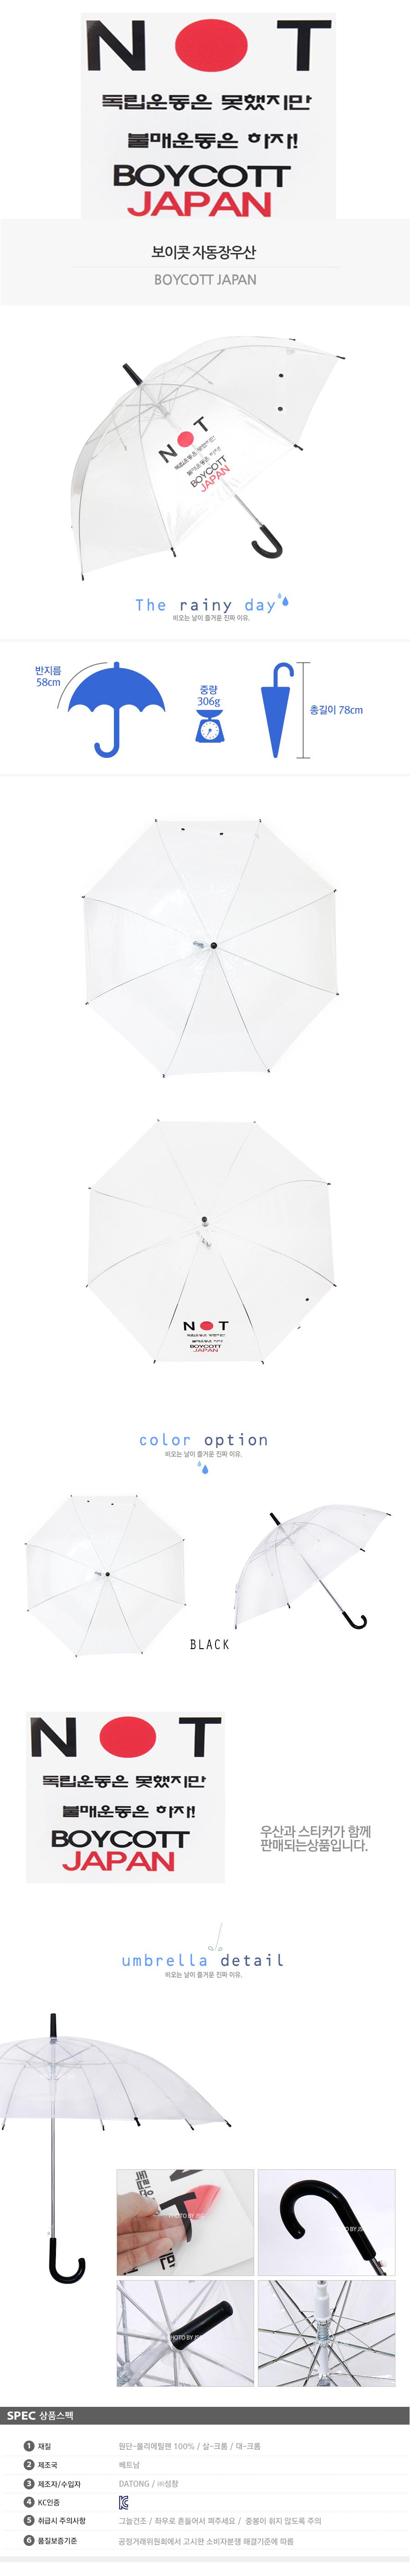 jsg 우산 .jpg